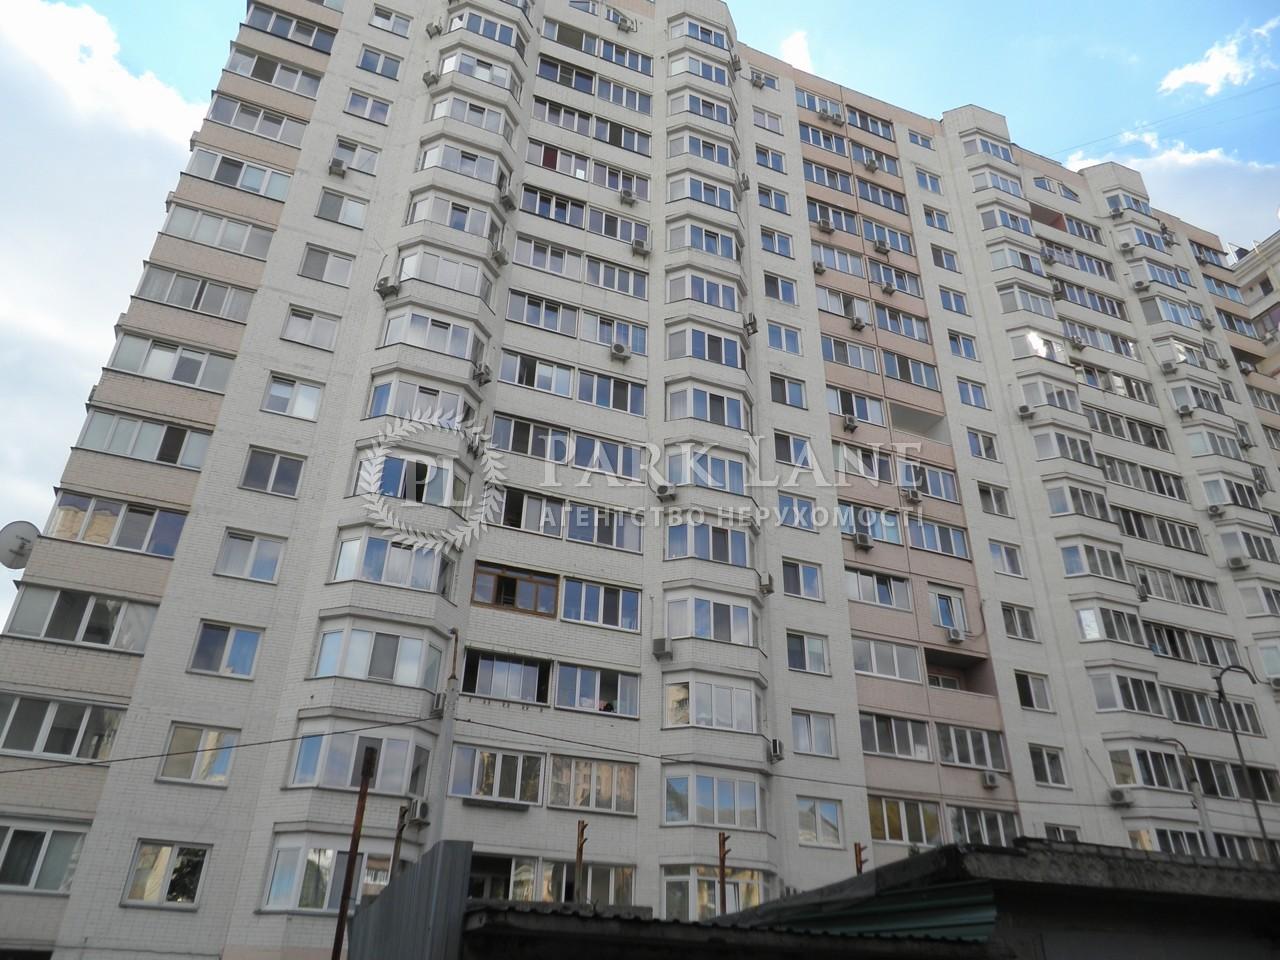 Квартира ул. Гайдара, 27, Киев, M-38029 - Фото 1